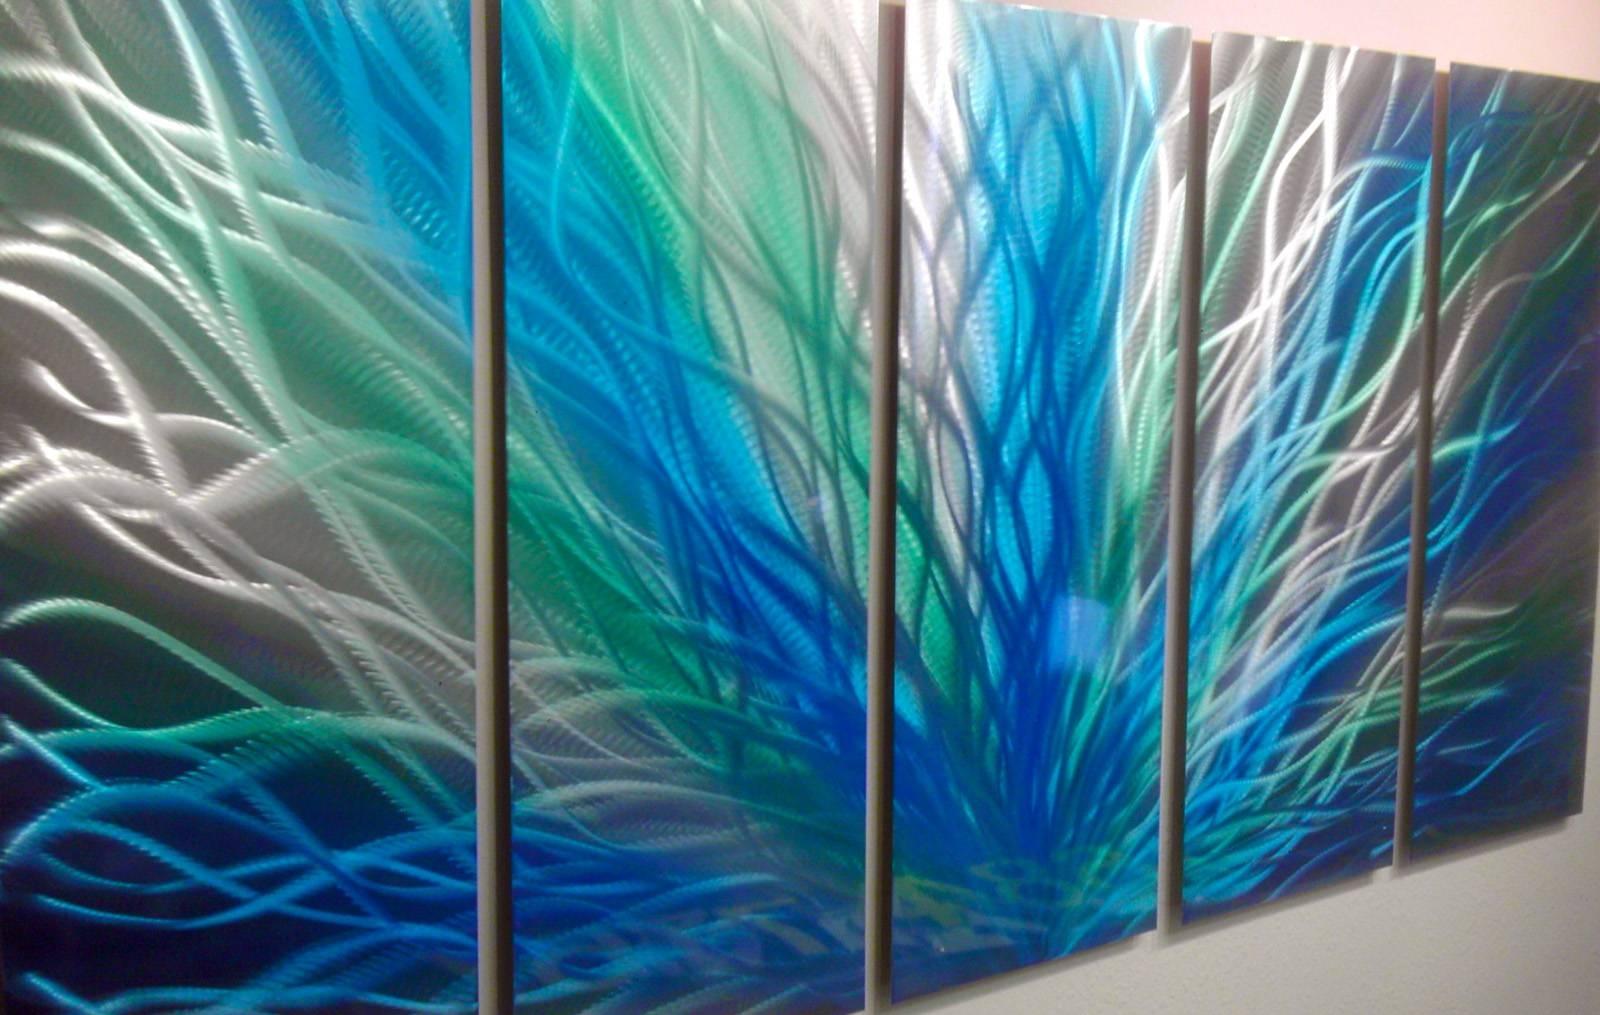 Radiance Large, Green Blue Metal Wall Art Contemporary Modern Regarding Current Blue Metal Wall Art (View 13 of 20)